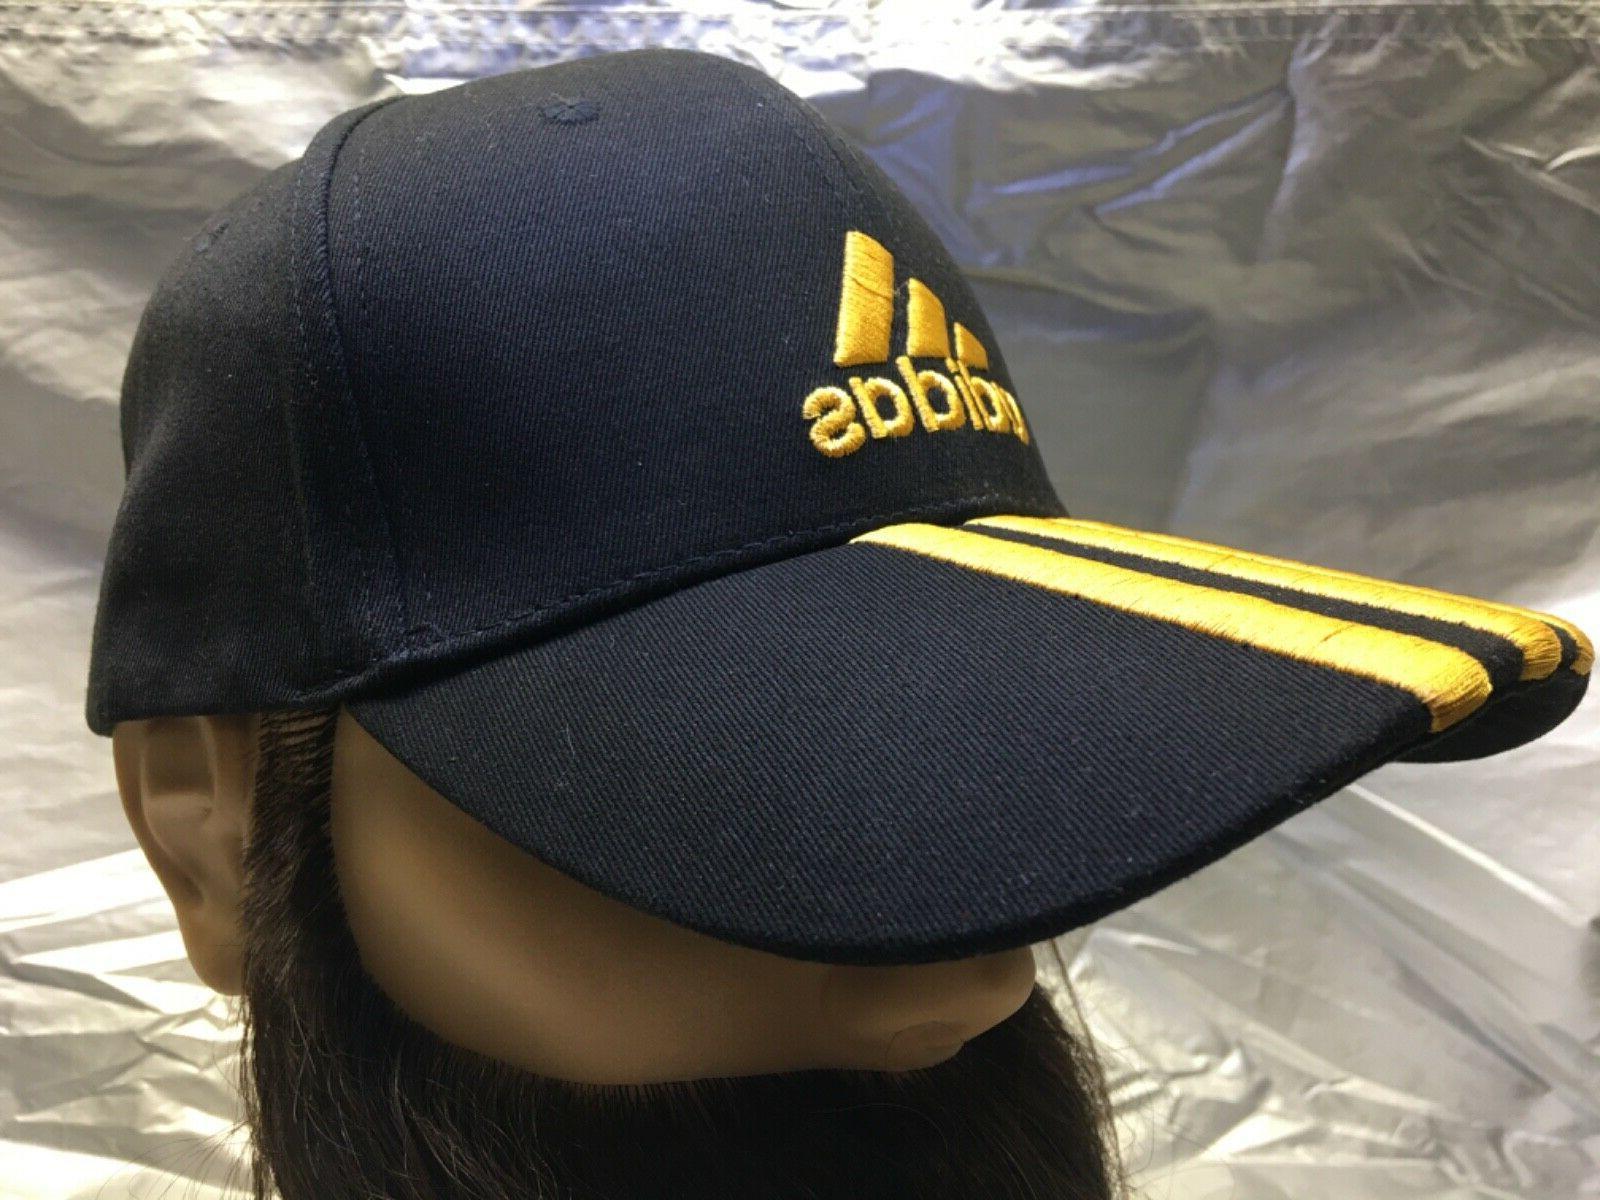 ADIDAS Cap Black w/Gold Emblem Dad Hat